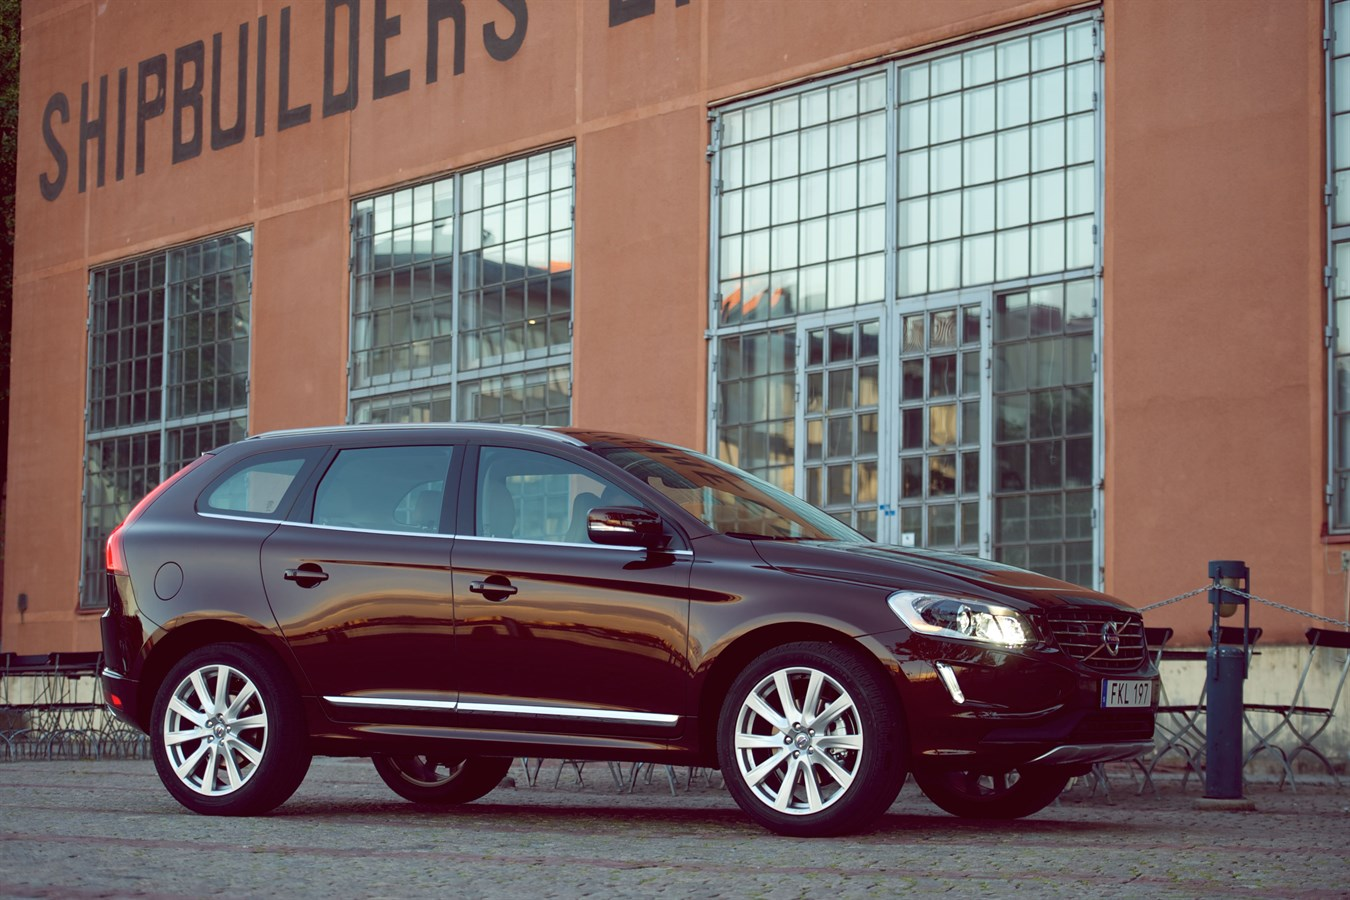 Volvo XC60 - model year 2015